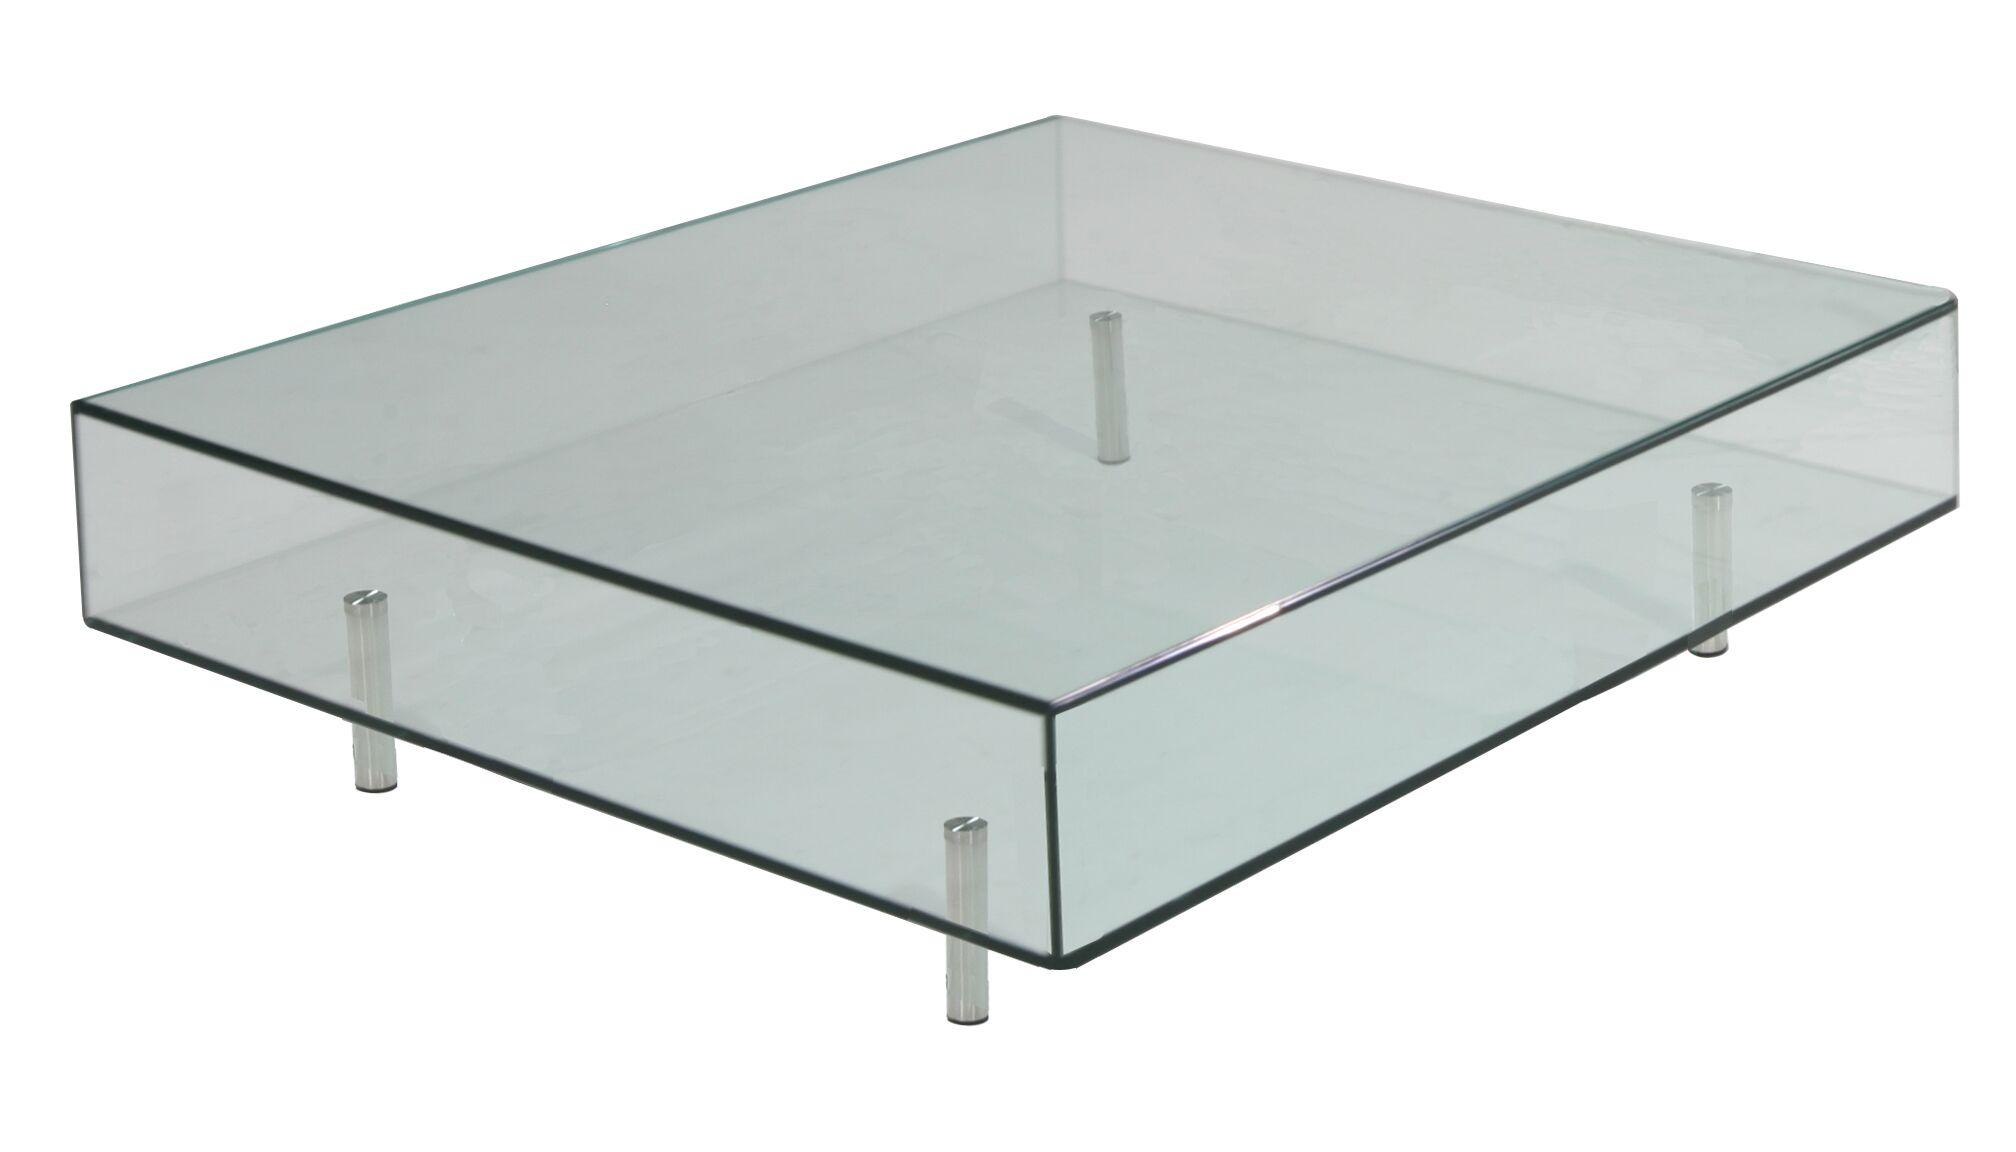 Arron Coffee Table Size: 30